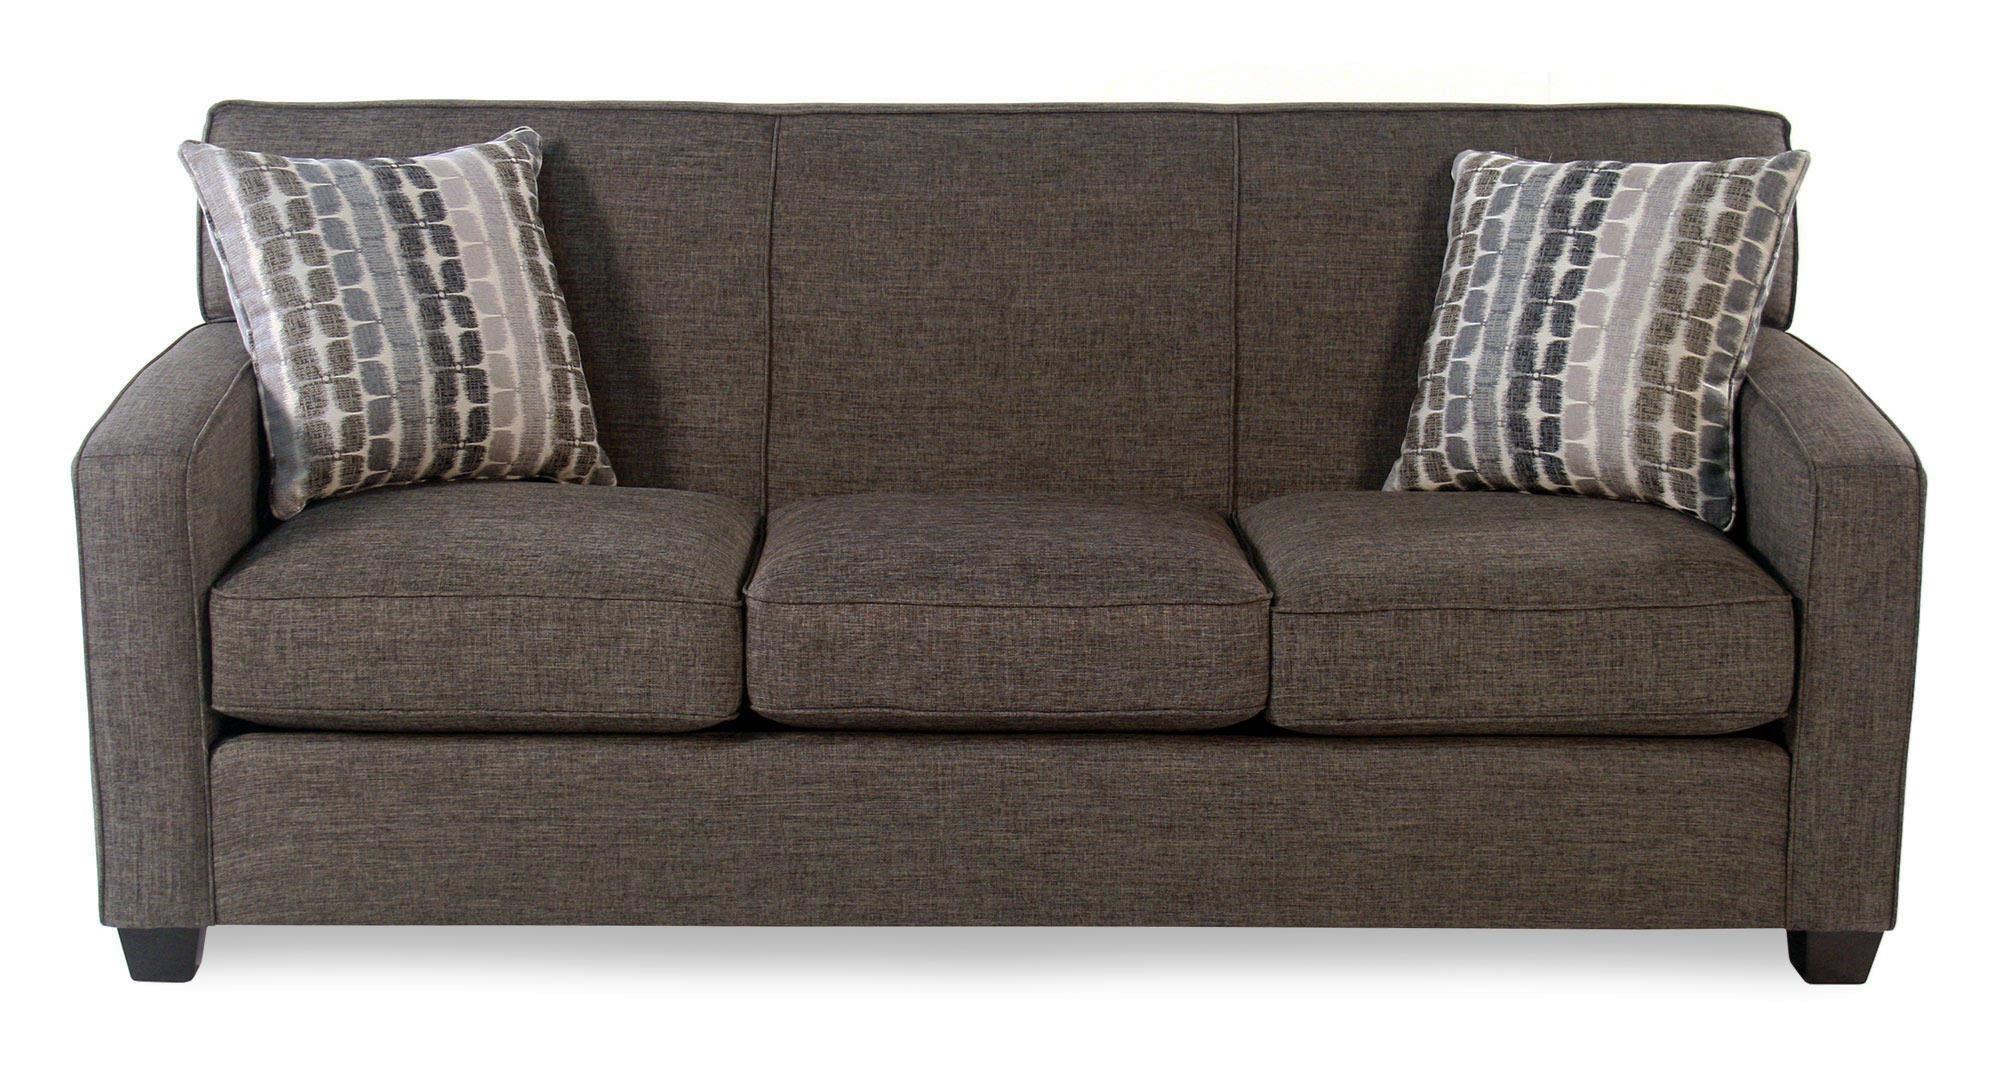 Decor-Rest Pebblestone Sofa - Item Number: 2299-01-FALCONE-GRAPHITE